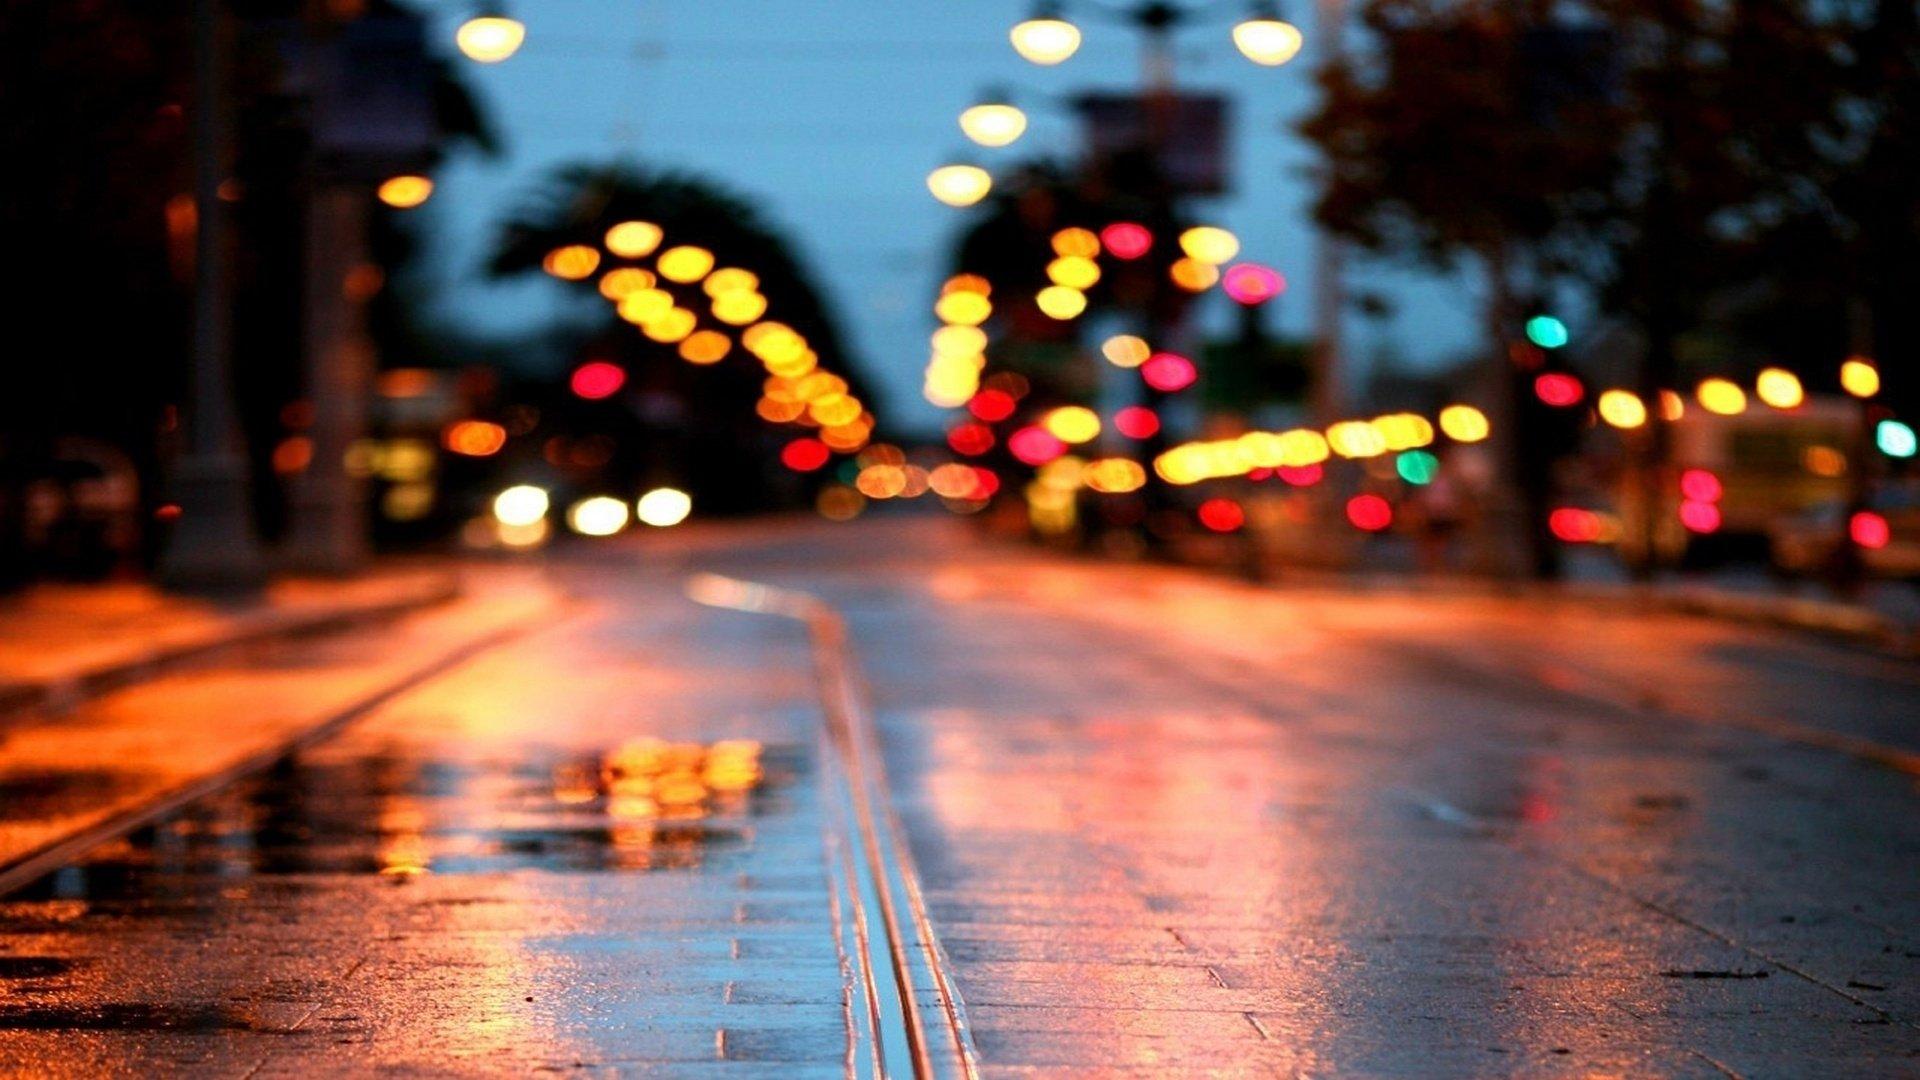 Hd wallpaper rain - Hd Wallpaper Background Id 262947 1920x1080 Photography Rain